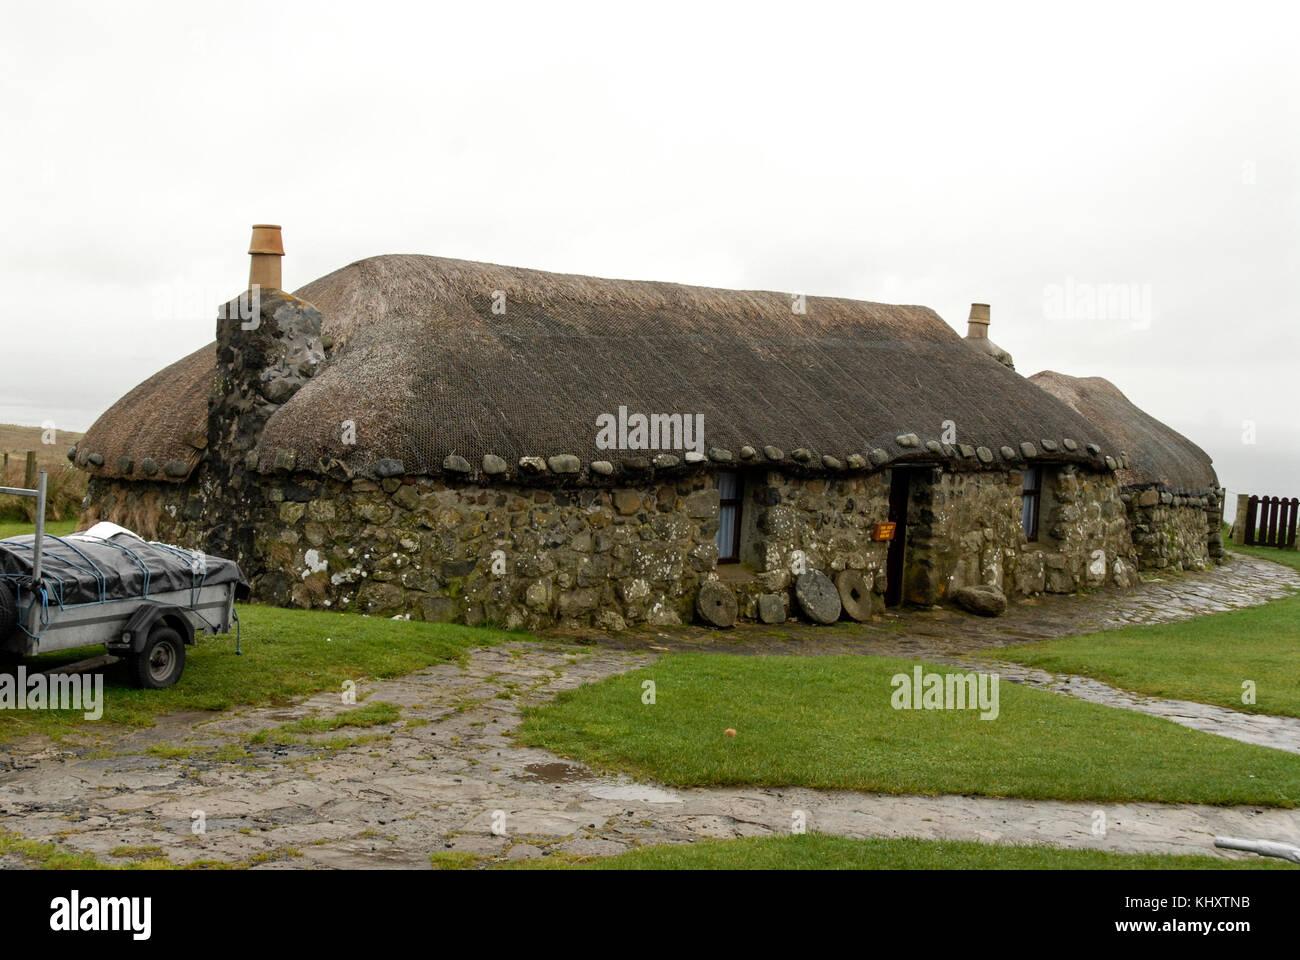 The Isle of Skye's croft museum at Kilmir near Portree on the Isle of Skye, in Scotland, Britain. - Stock Image